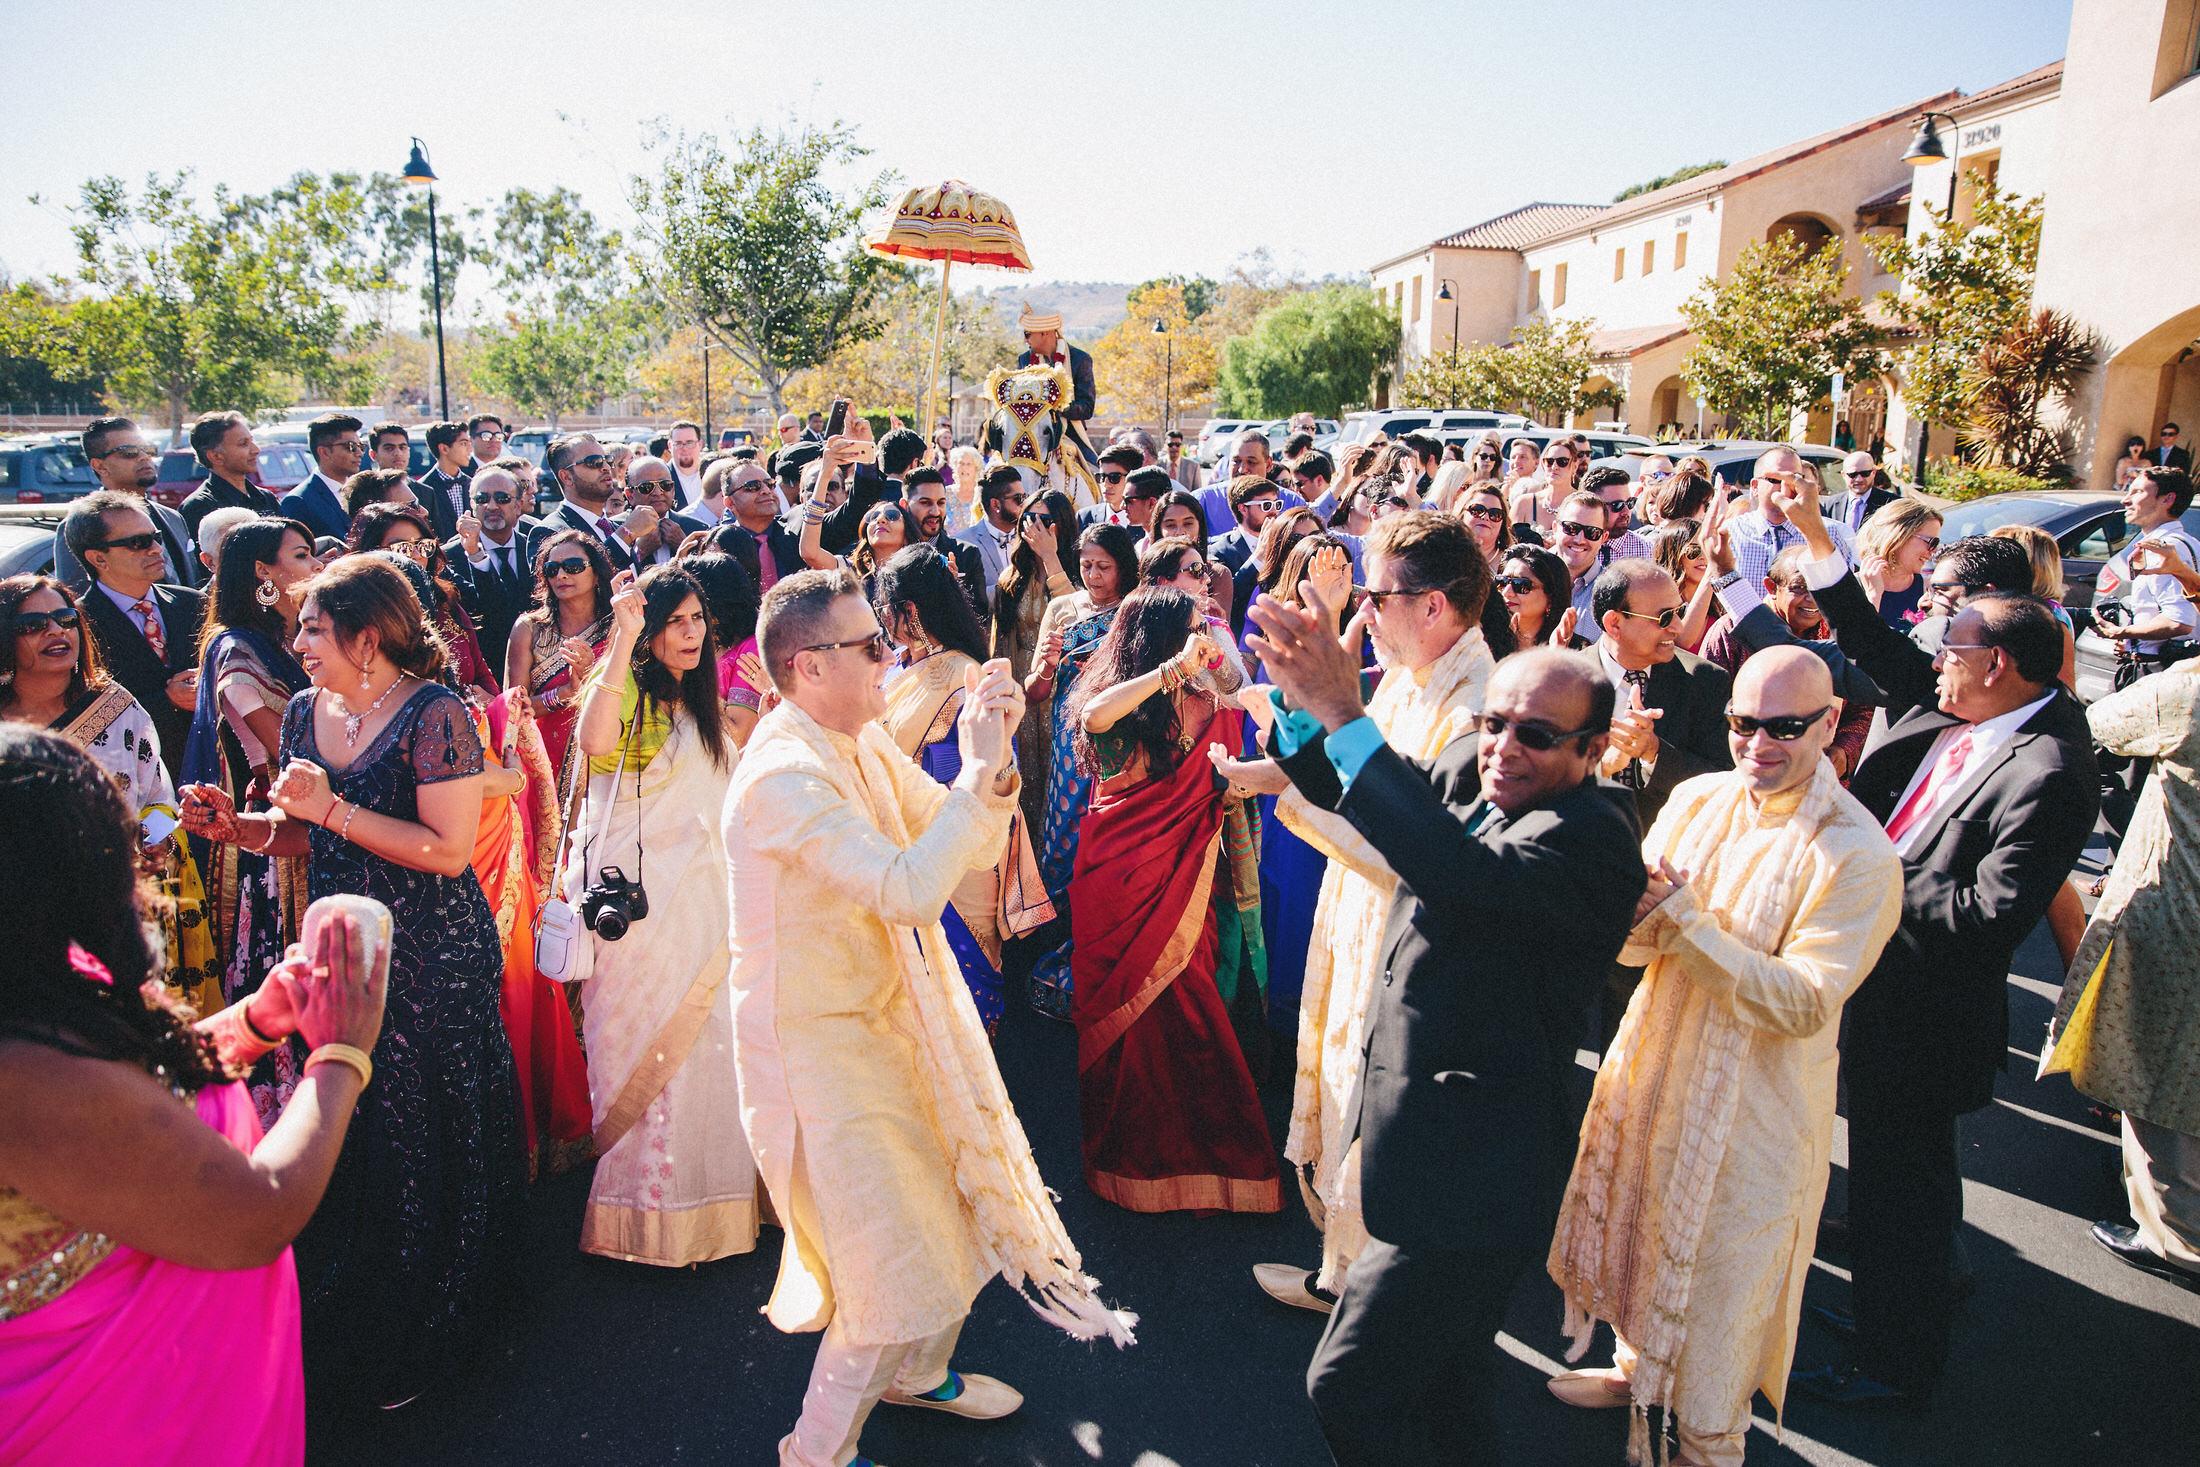 Modern-Indian-Serra-Plaza-wedding-041.jpg